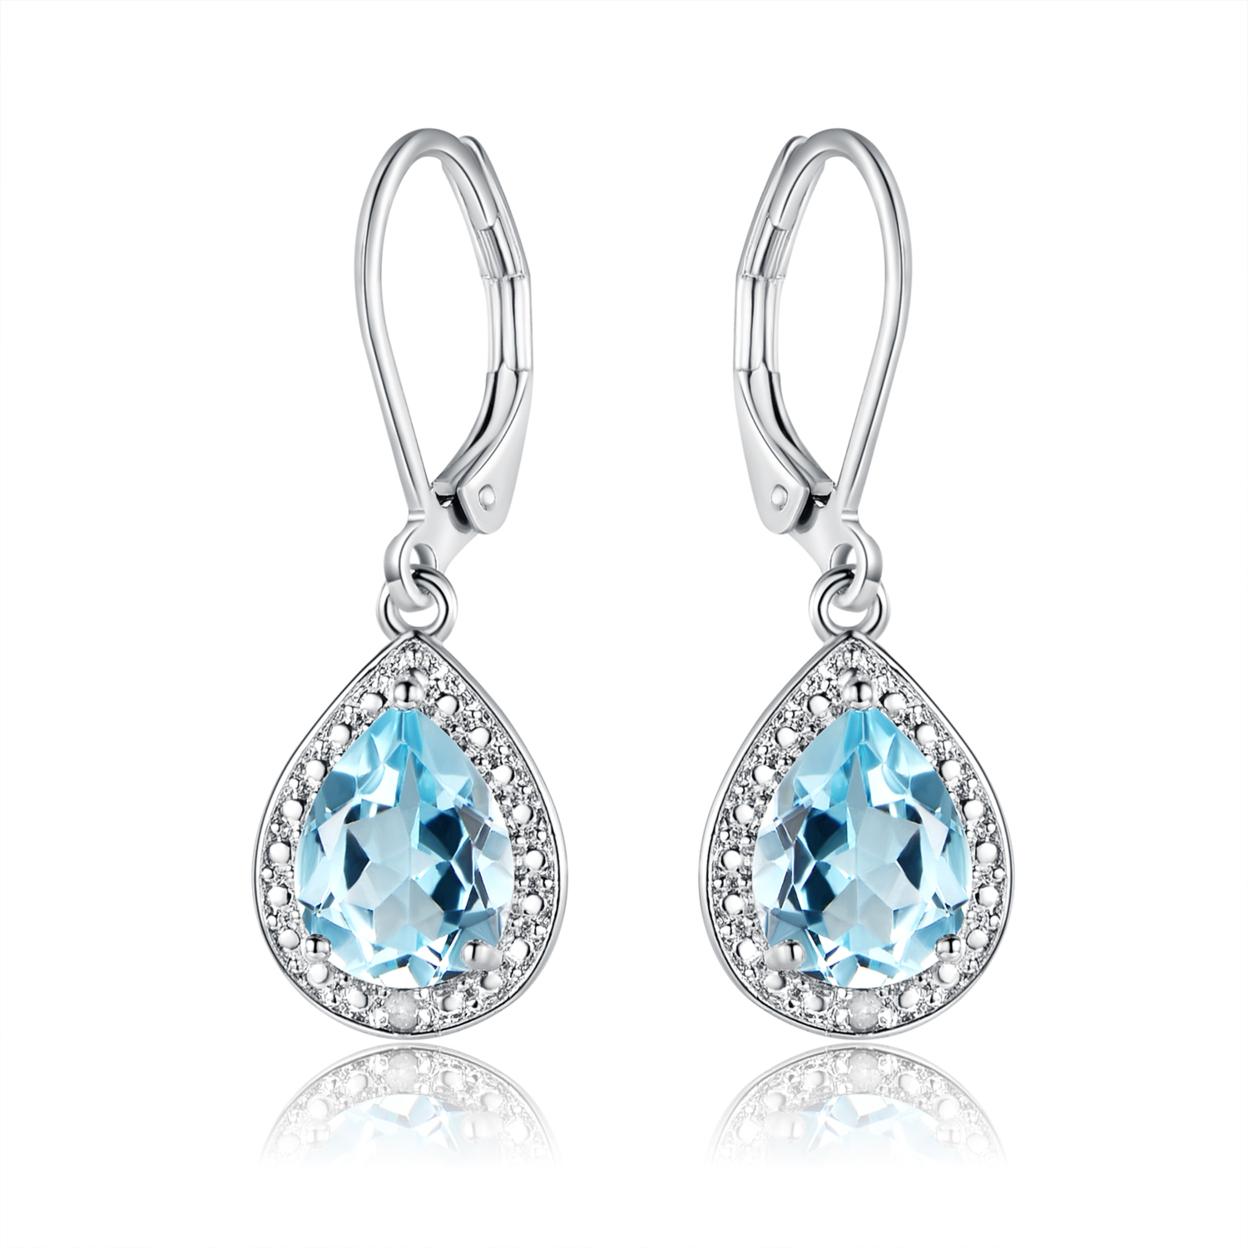 18k White Gold Plated 4.00cttw Genuine Blue Topaz & Diamond Accent Drop Earrings Er5157-06